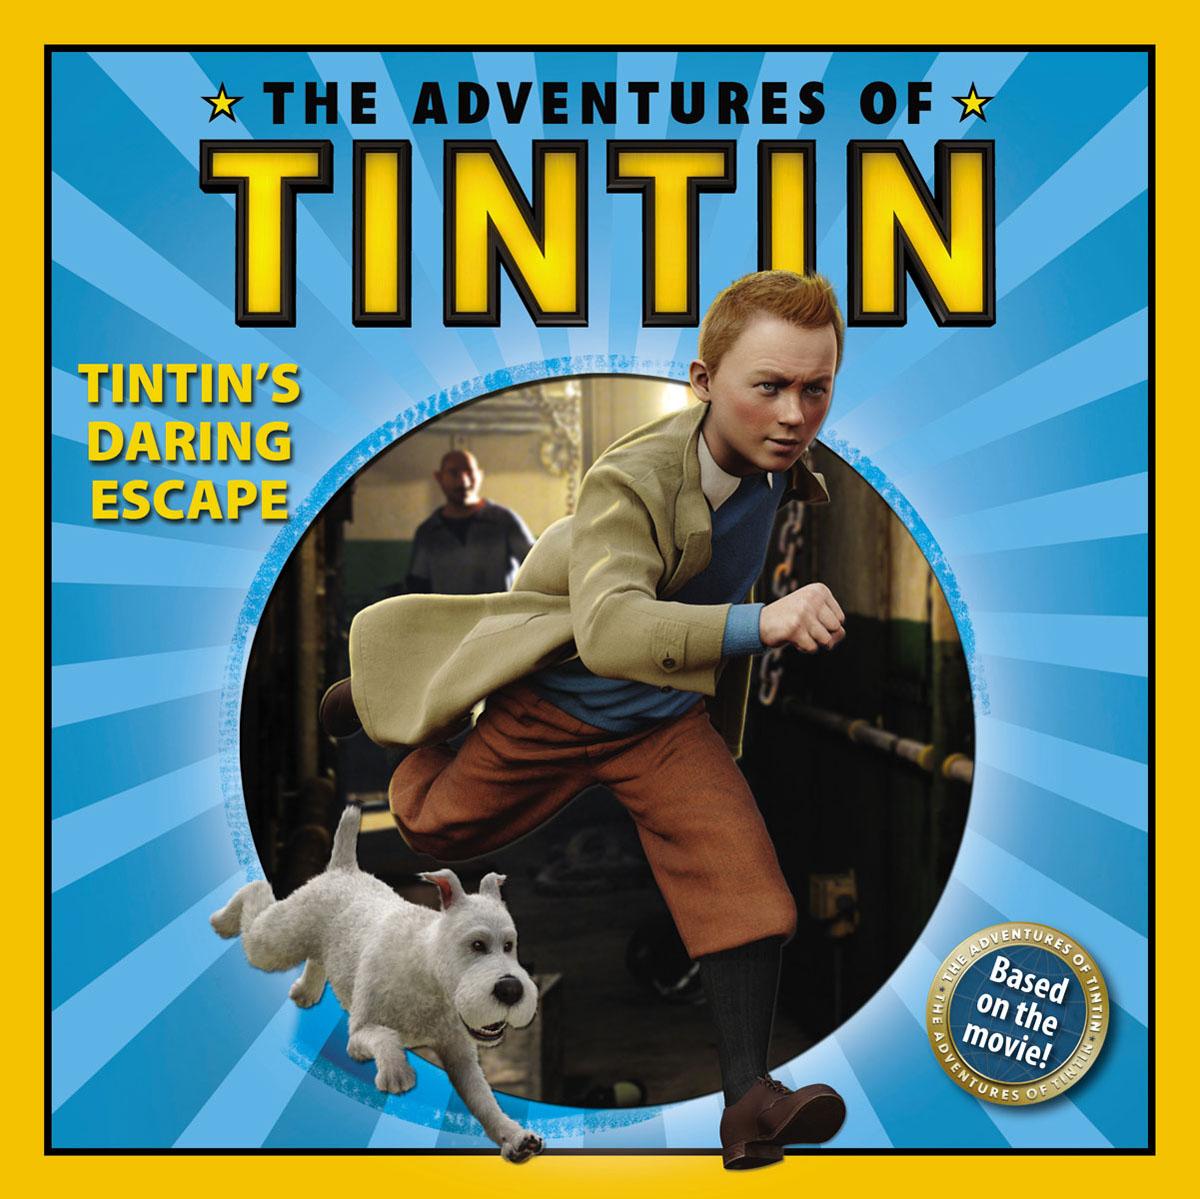 Bantam Books. The Adventures of Tintin: Tintin's Daring Escape